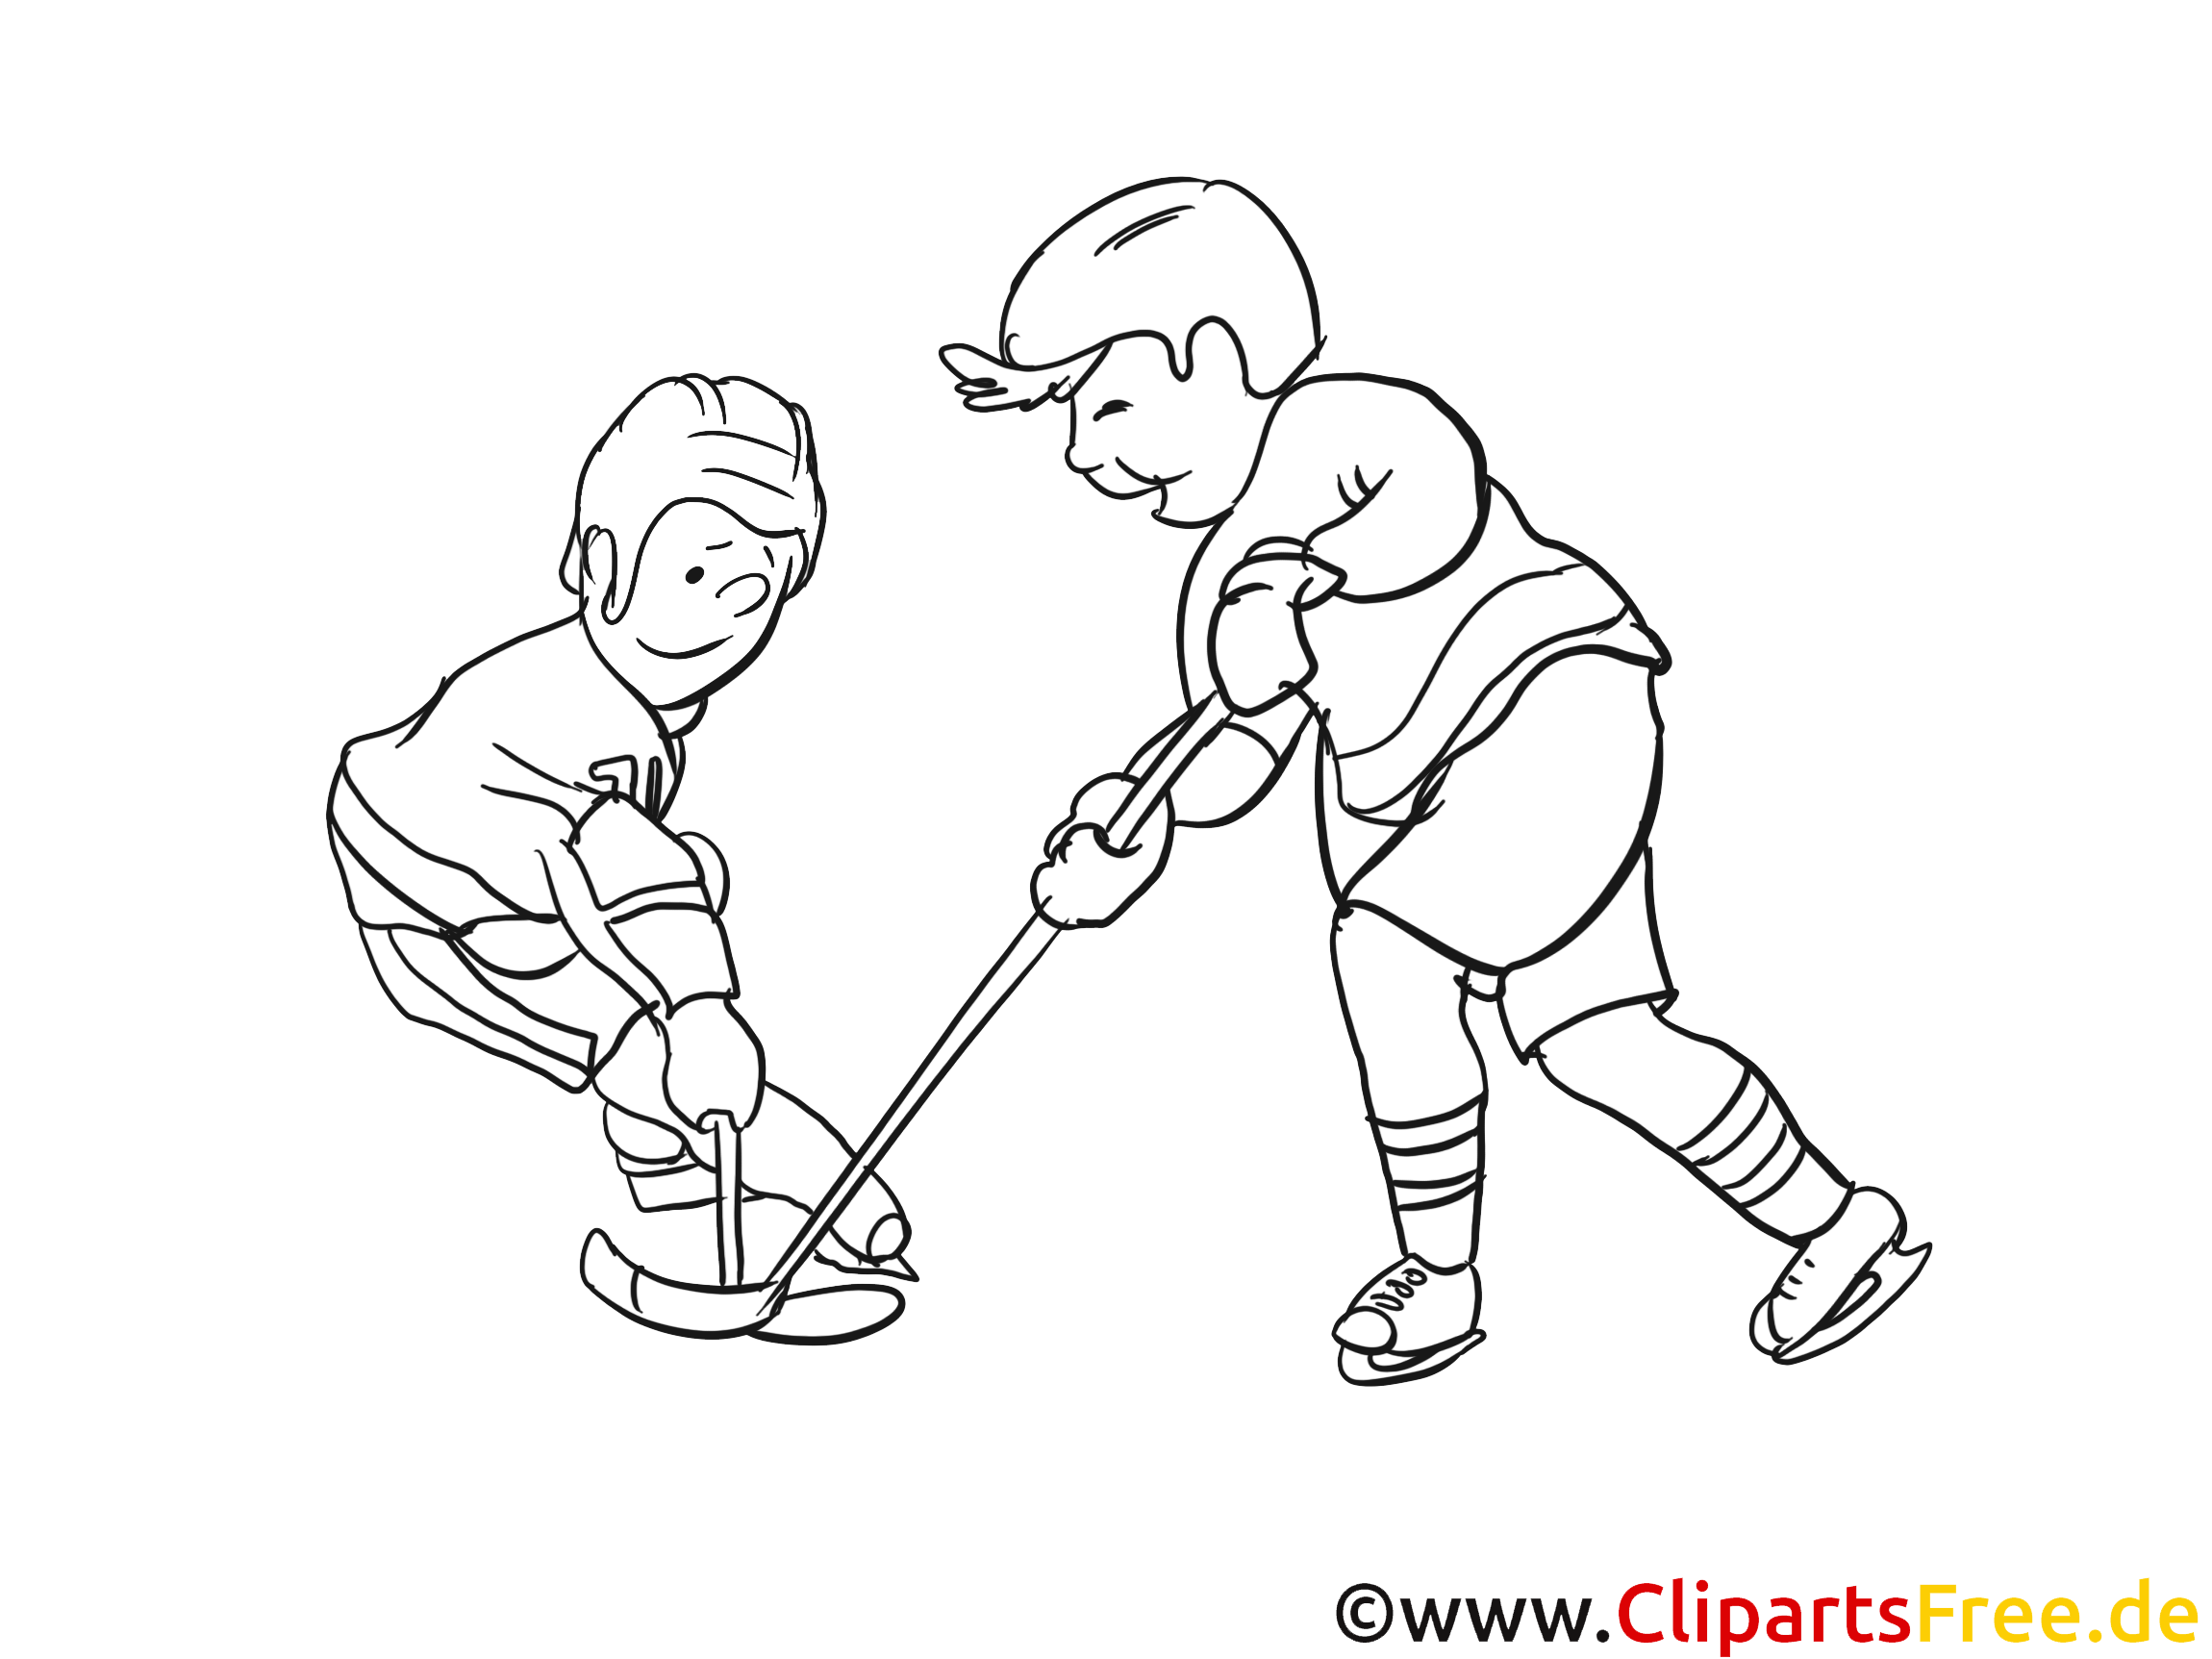 Hockeyeurs Dessin Hockey Gratuits A Imprimer Hockey Sur Glace